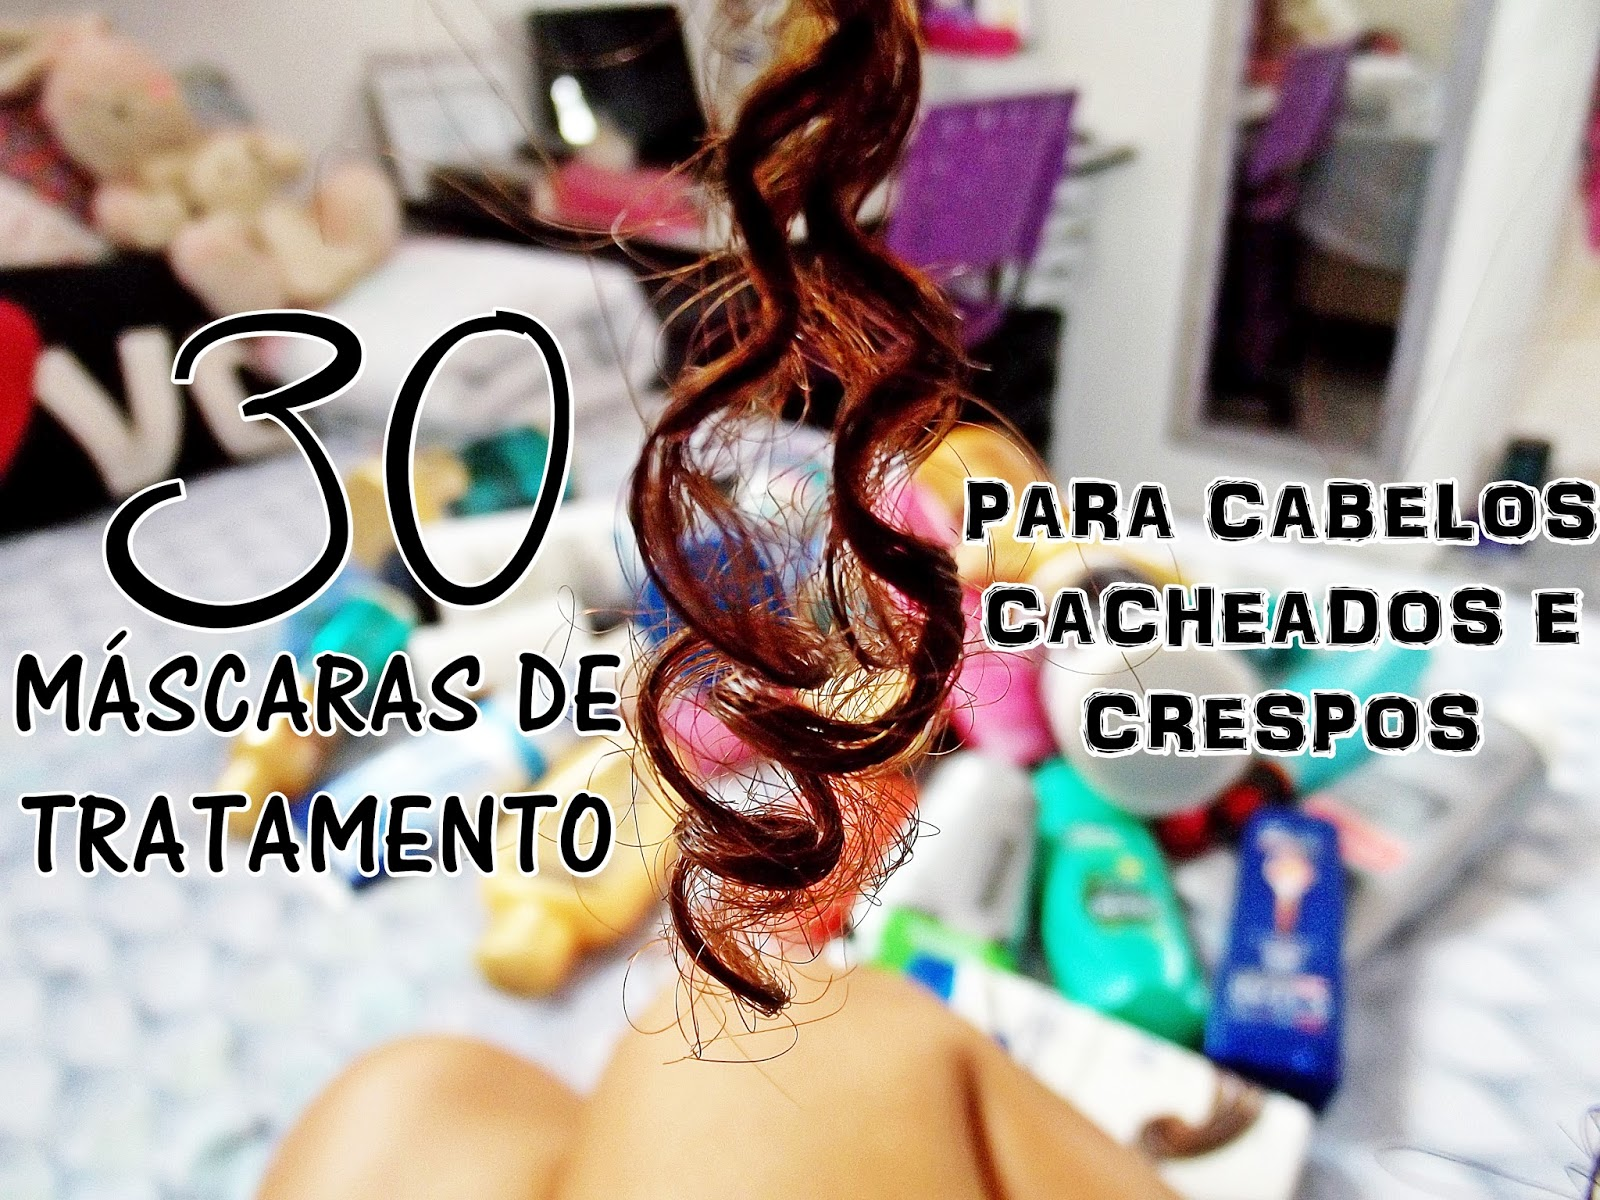 30 opções de máscaras de tratamento para cabelos cacheados e crespos, kahchear, kahena kévya, kahena, cabelo cacheado, voltando aos cachos, mascaras ideais para cabelo cacheado, mascaras ideais para cabelos crespos, cachos, crespo, ondulado,